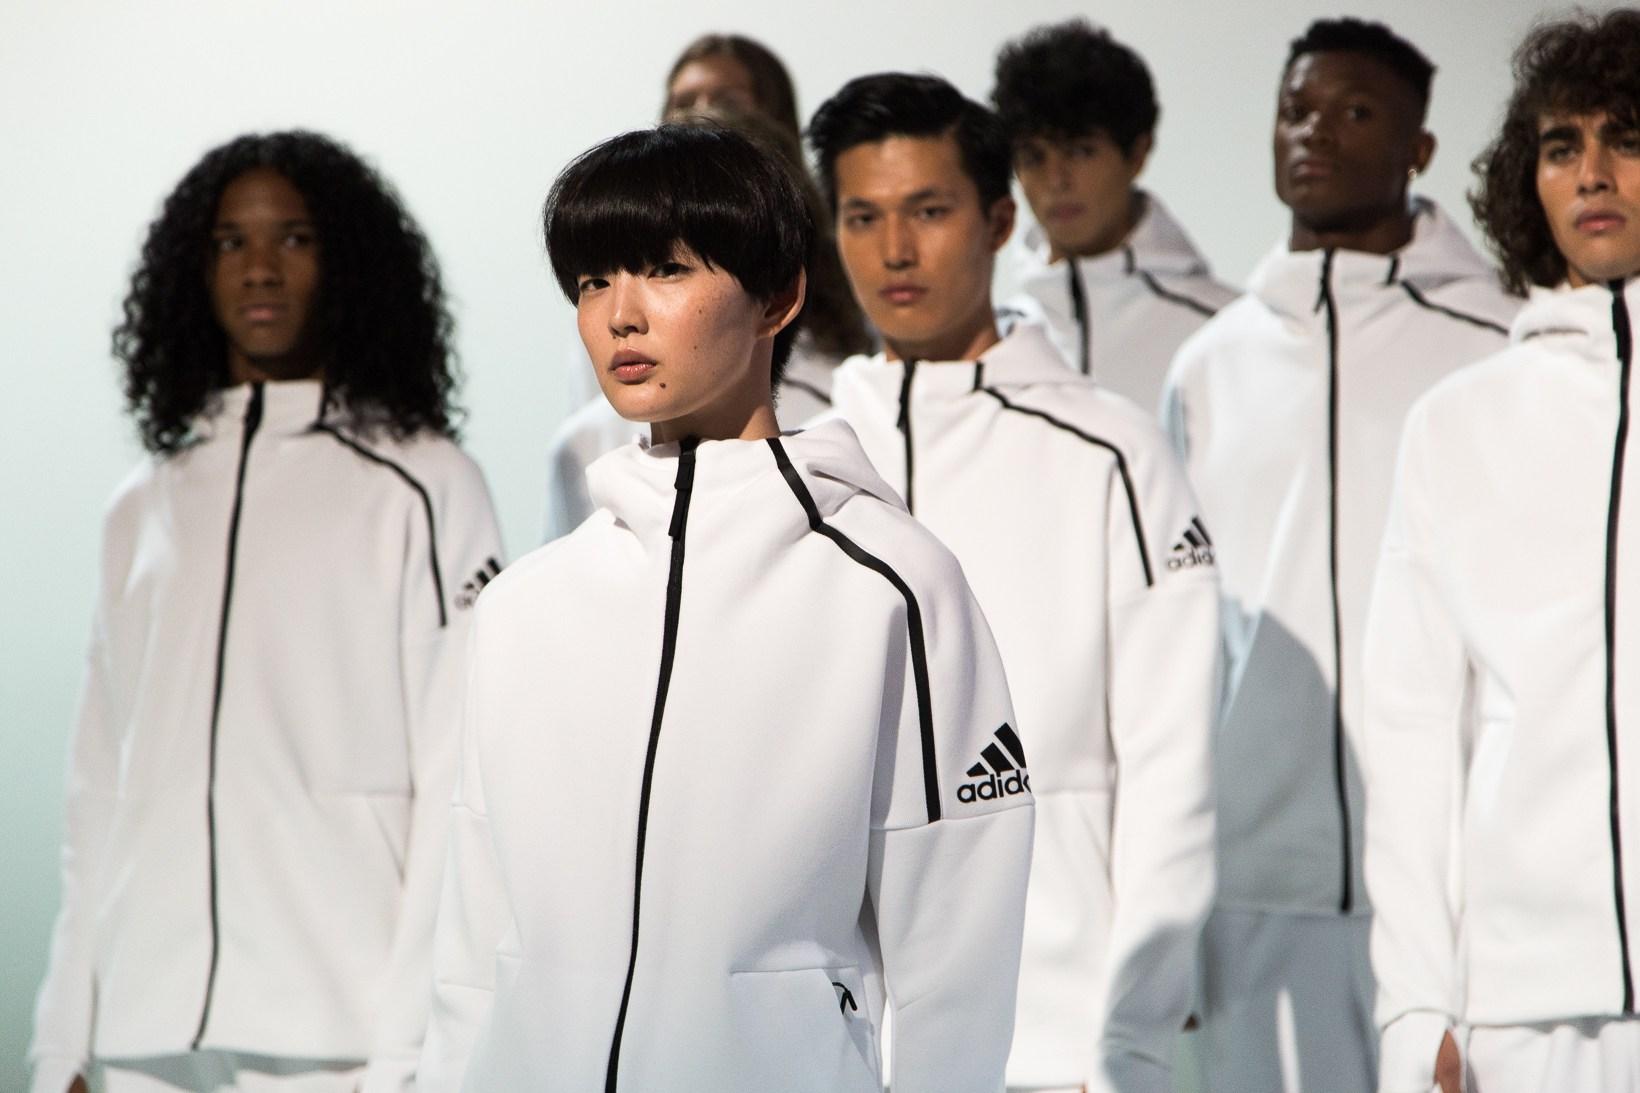 adidas Athletics Ushers in the Future of Athlete-Focused Sportswear